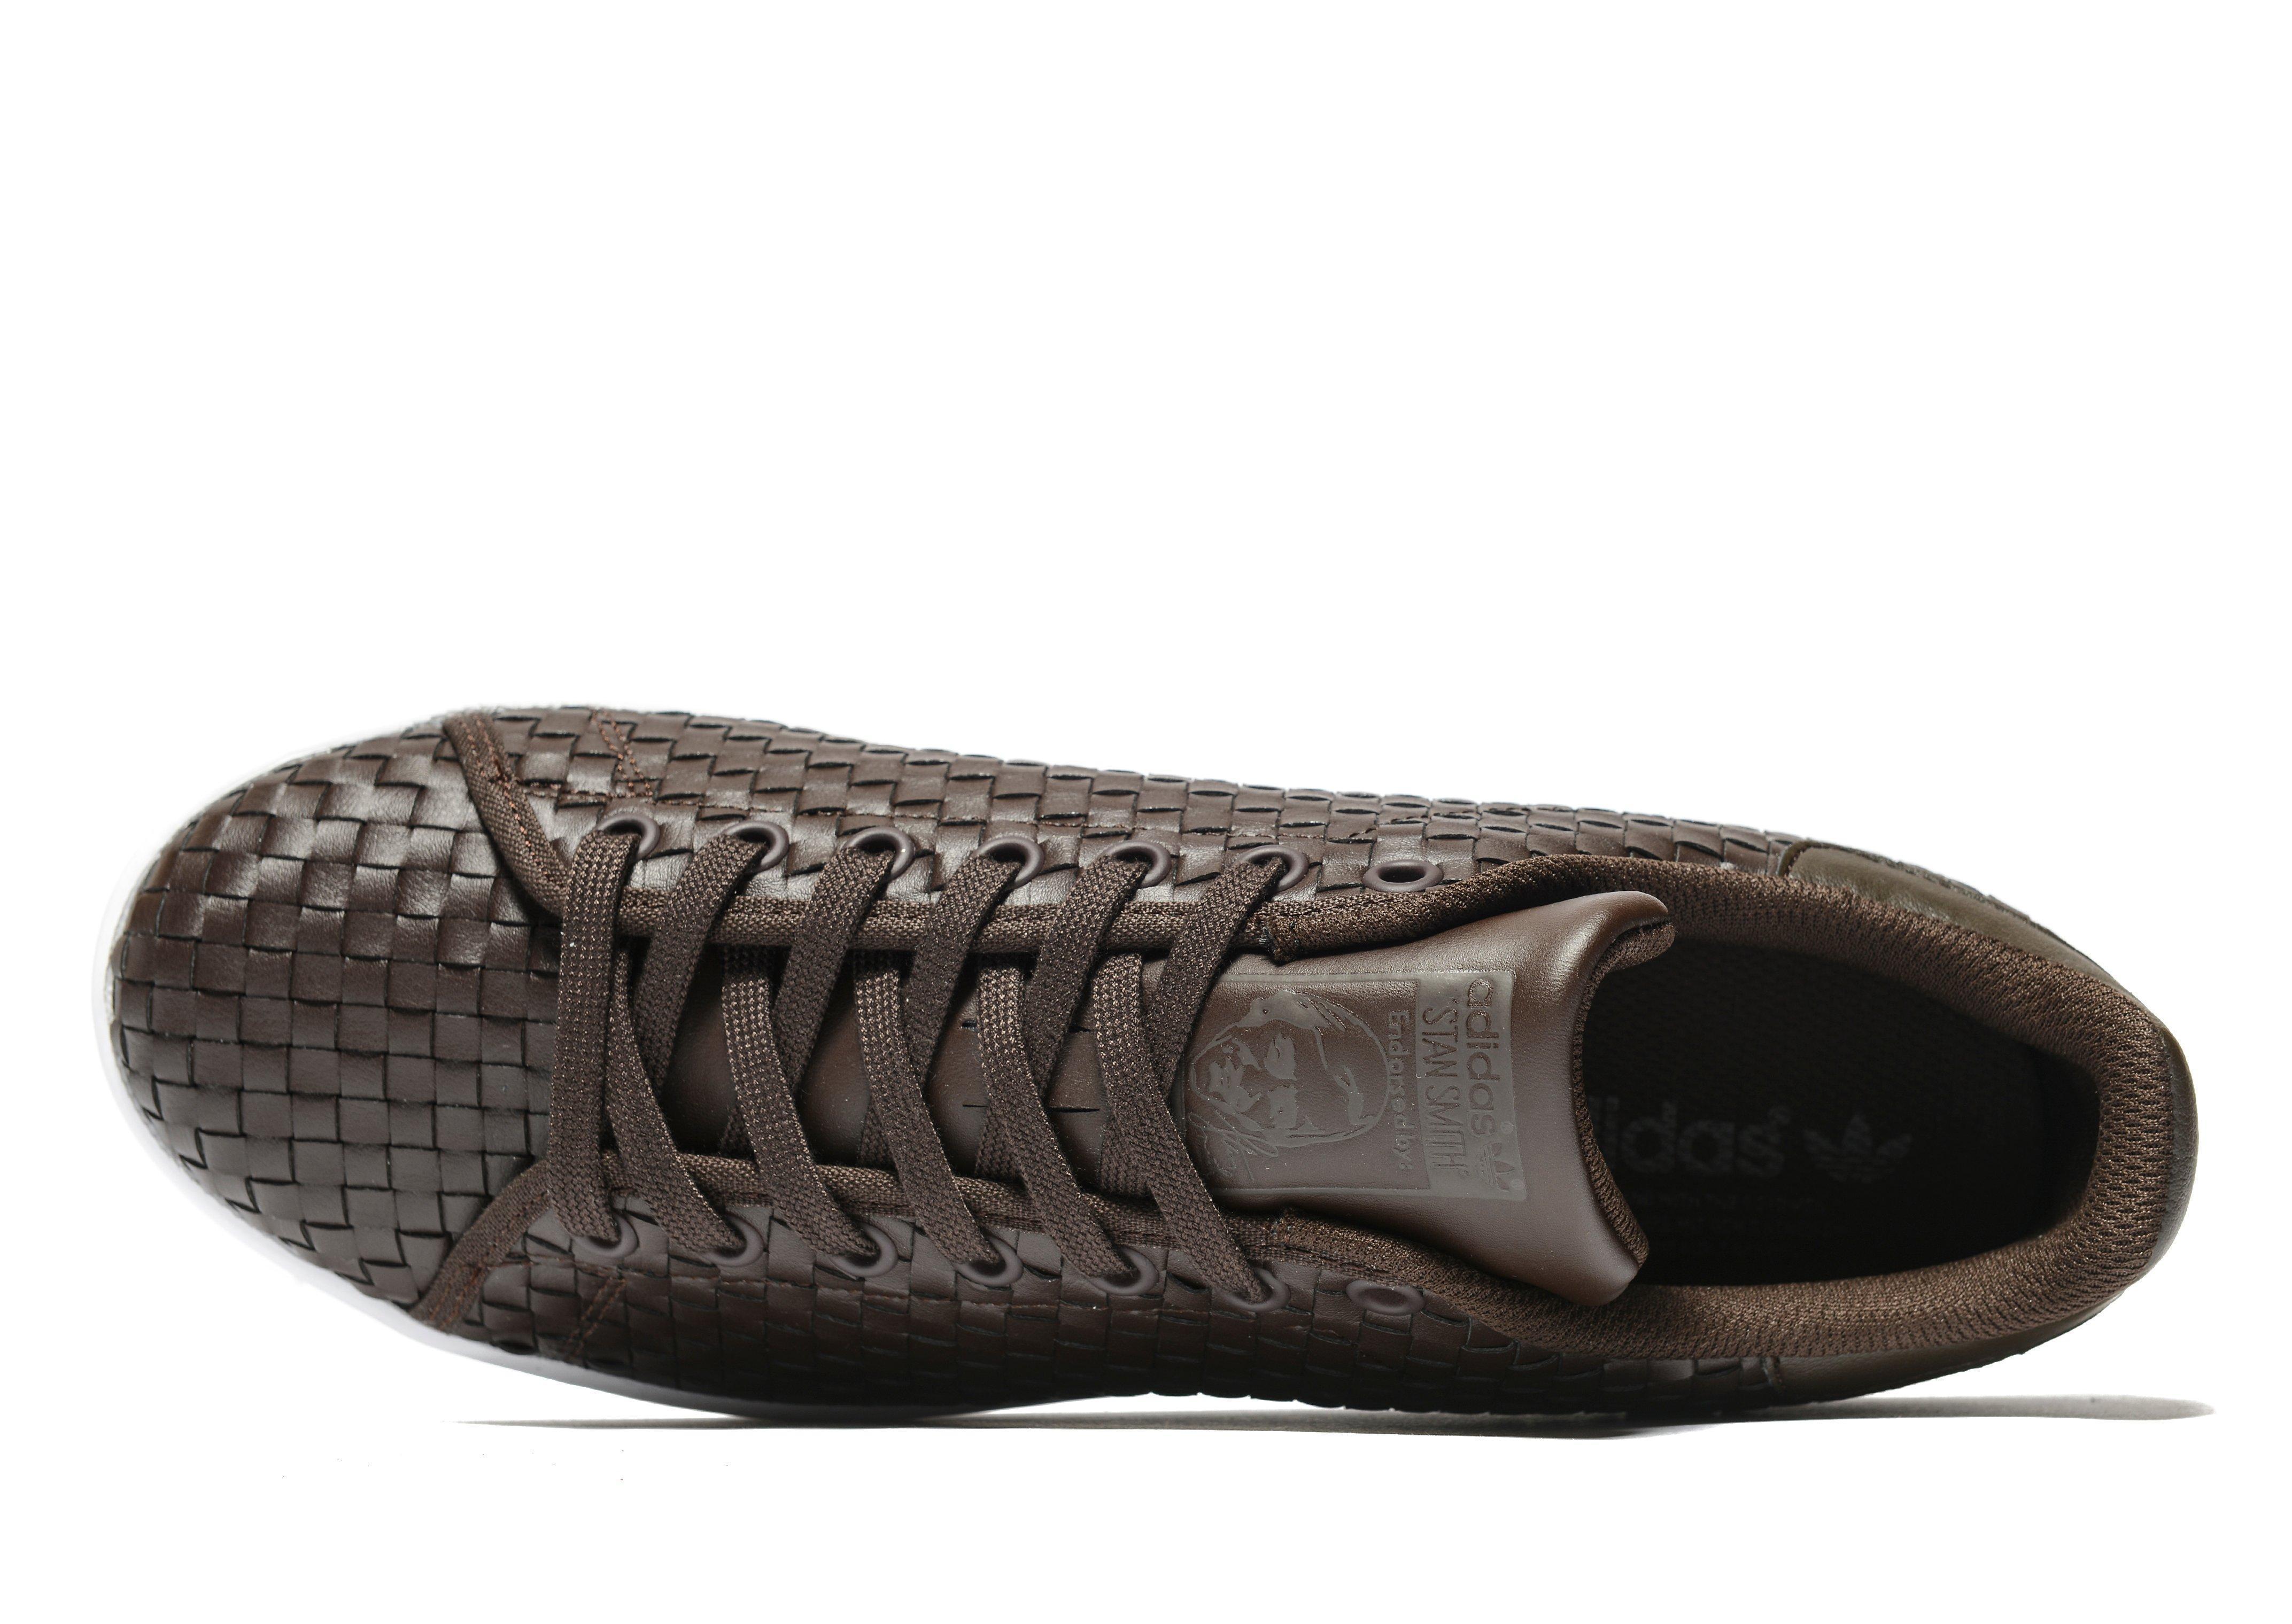 6a4a923291650 order adidas originals zx flux junior db5fe fd04a  50% off lyst adidas  originals stan smith weave in brown a1905 58096